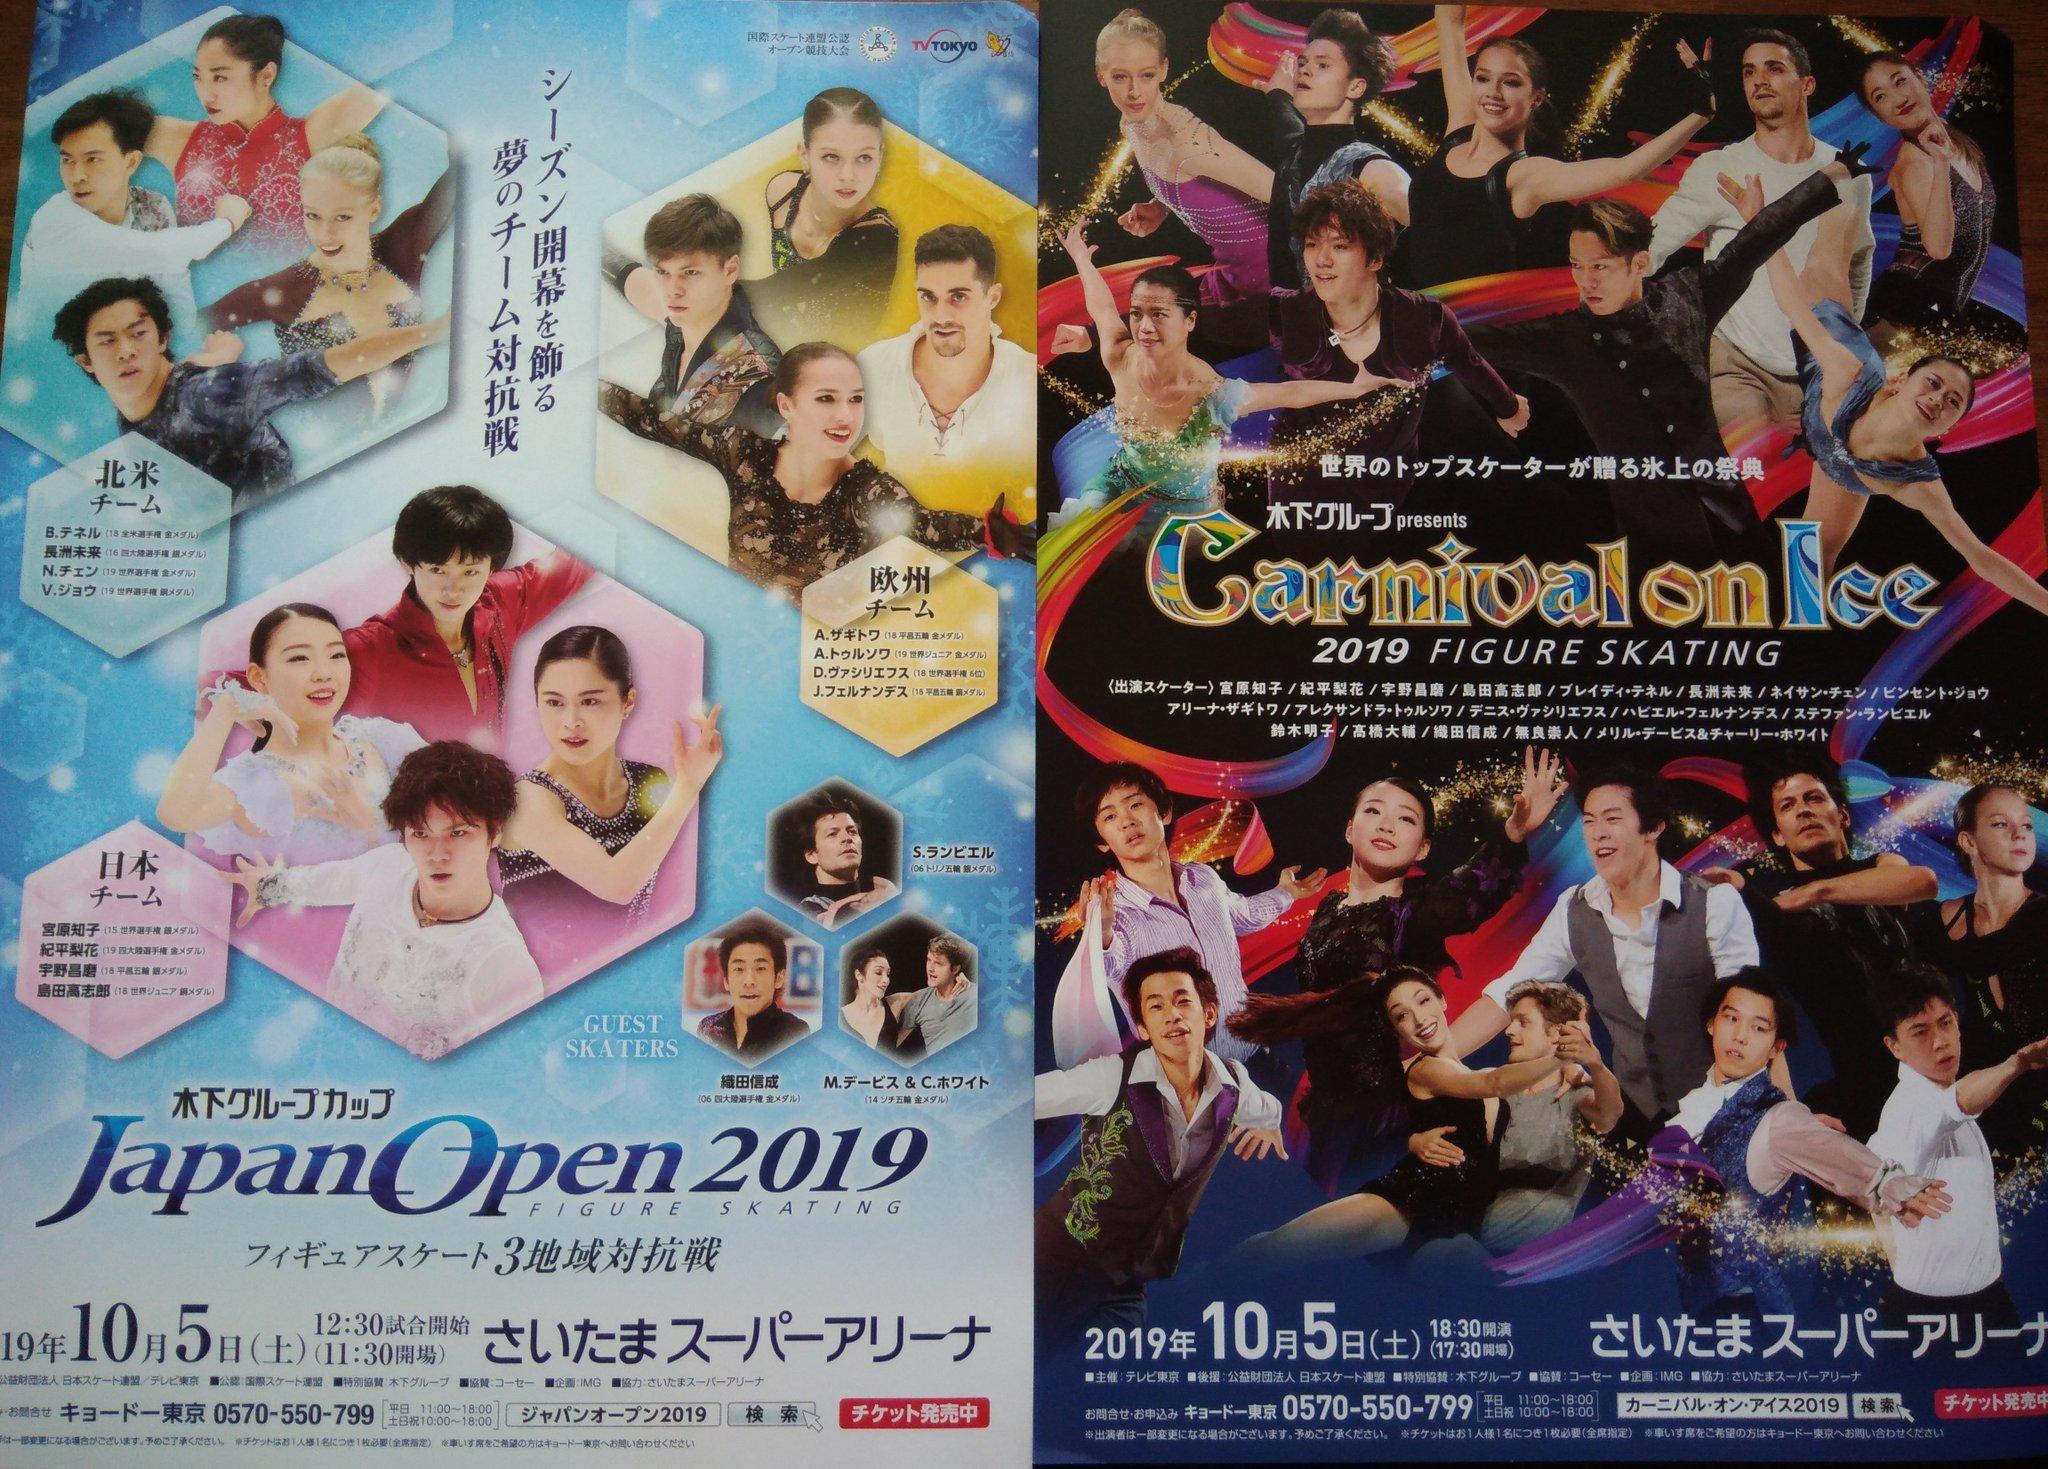 Japan Open 2019 | 5 октября 2019 | Saitama Super Arena - Страница 2 EFdIu7TVAAAKP_q?format=jpg&name=4096x4096